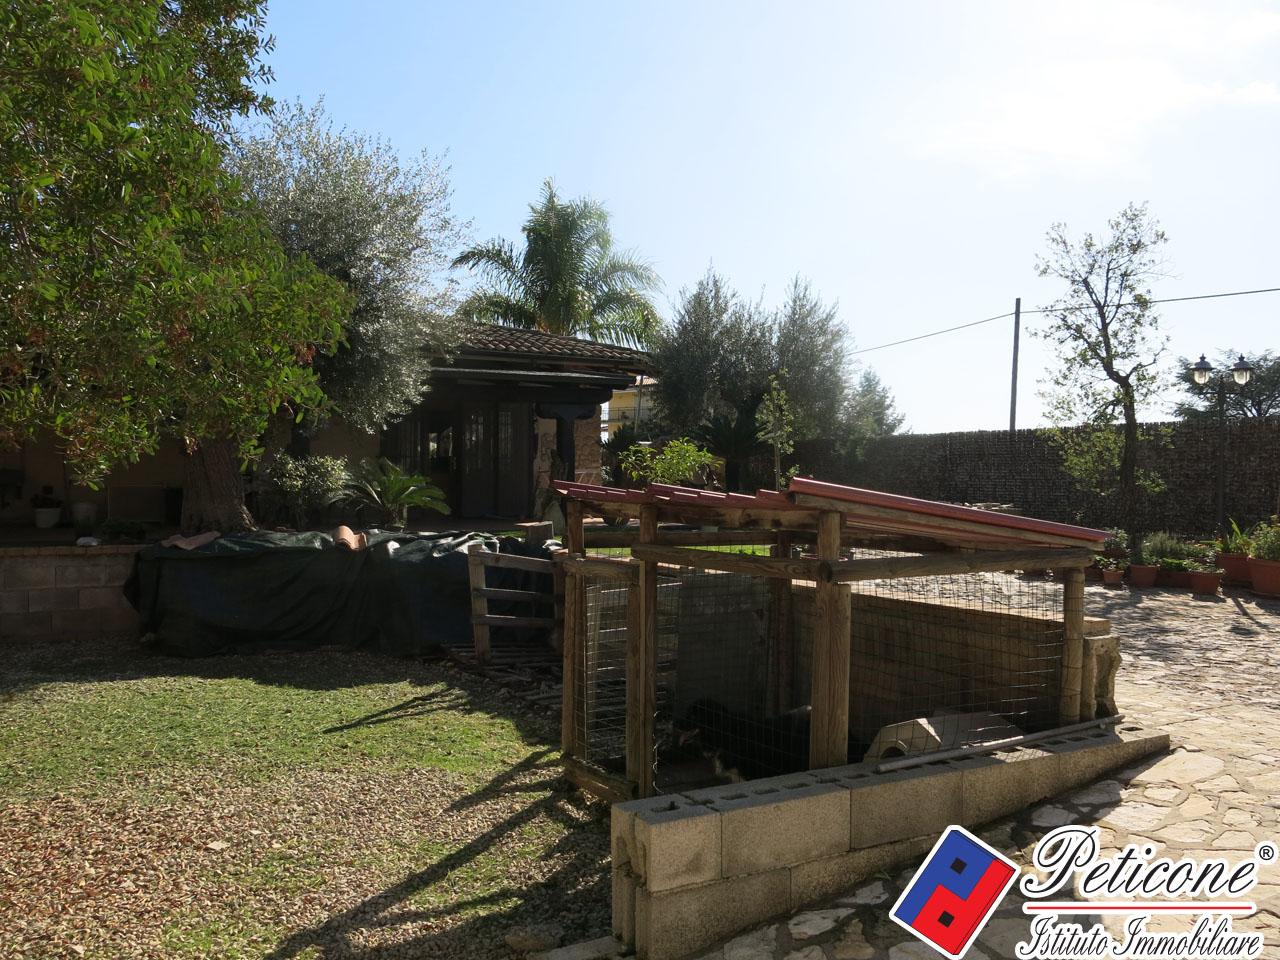 Villa in Vendita a Fondi: 3 locali, 107 mq - Foto 24